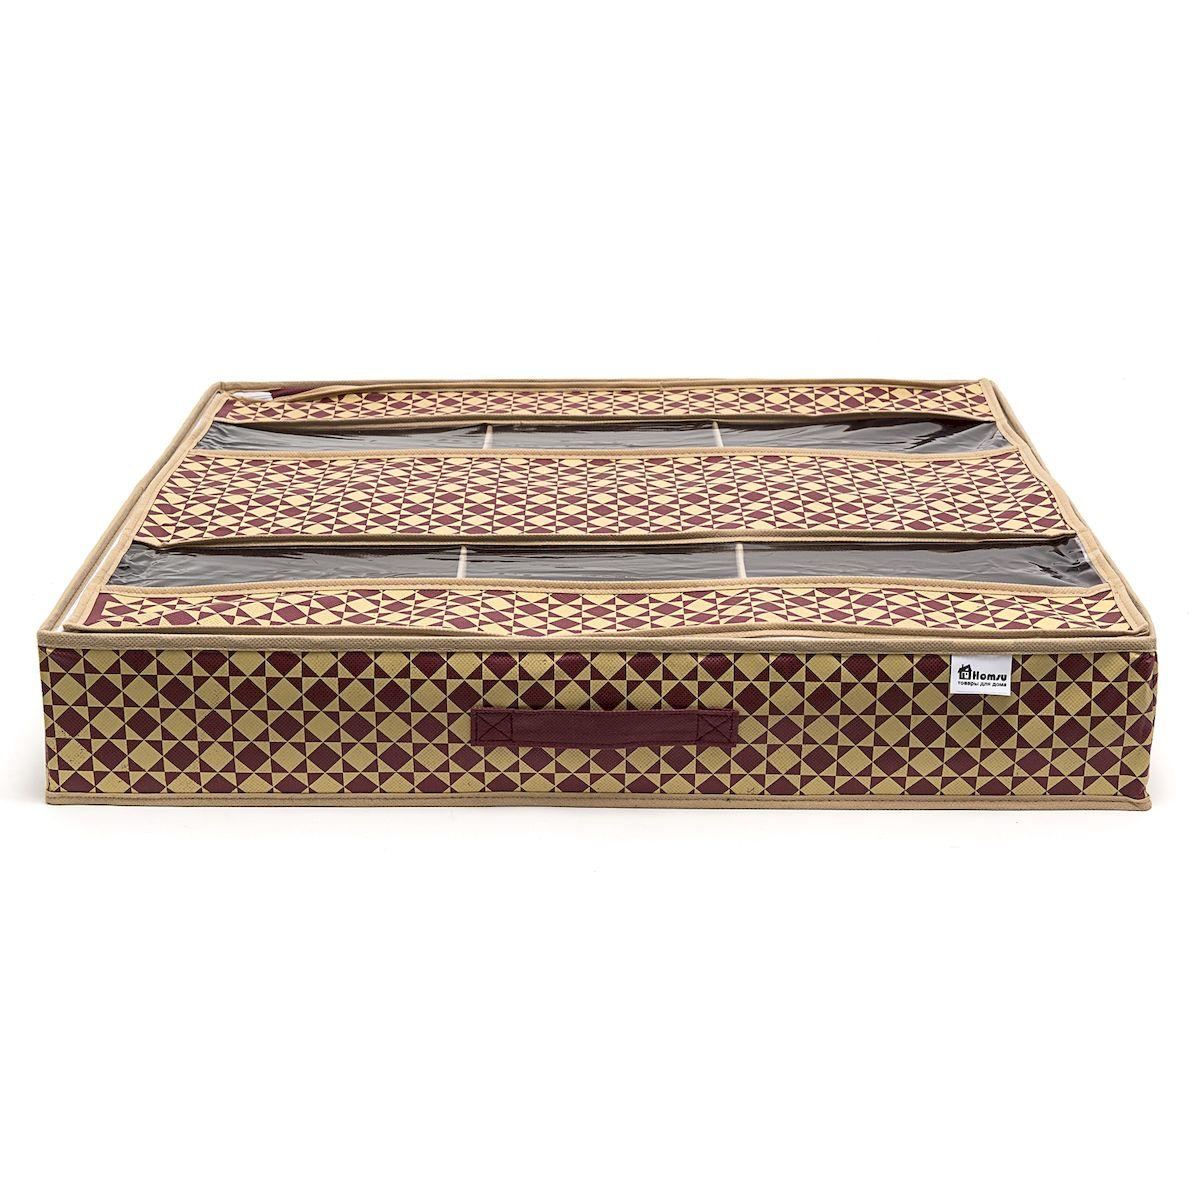 Органайзер для обуви Homsu Bordo, 66 х 63 х 11 см кофры homsu органайзер для обуви на 6 боксов capri